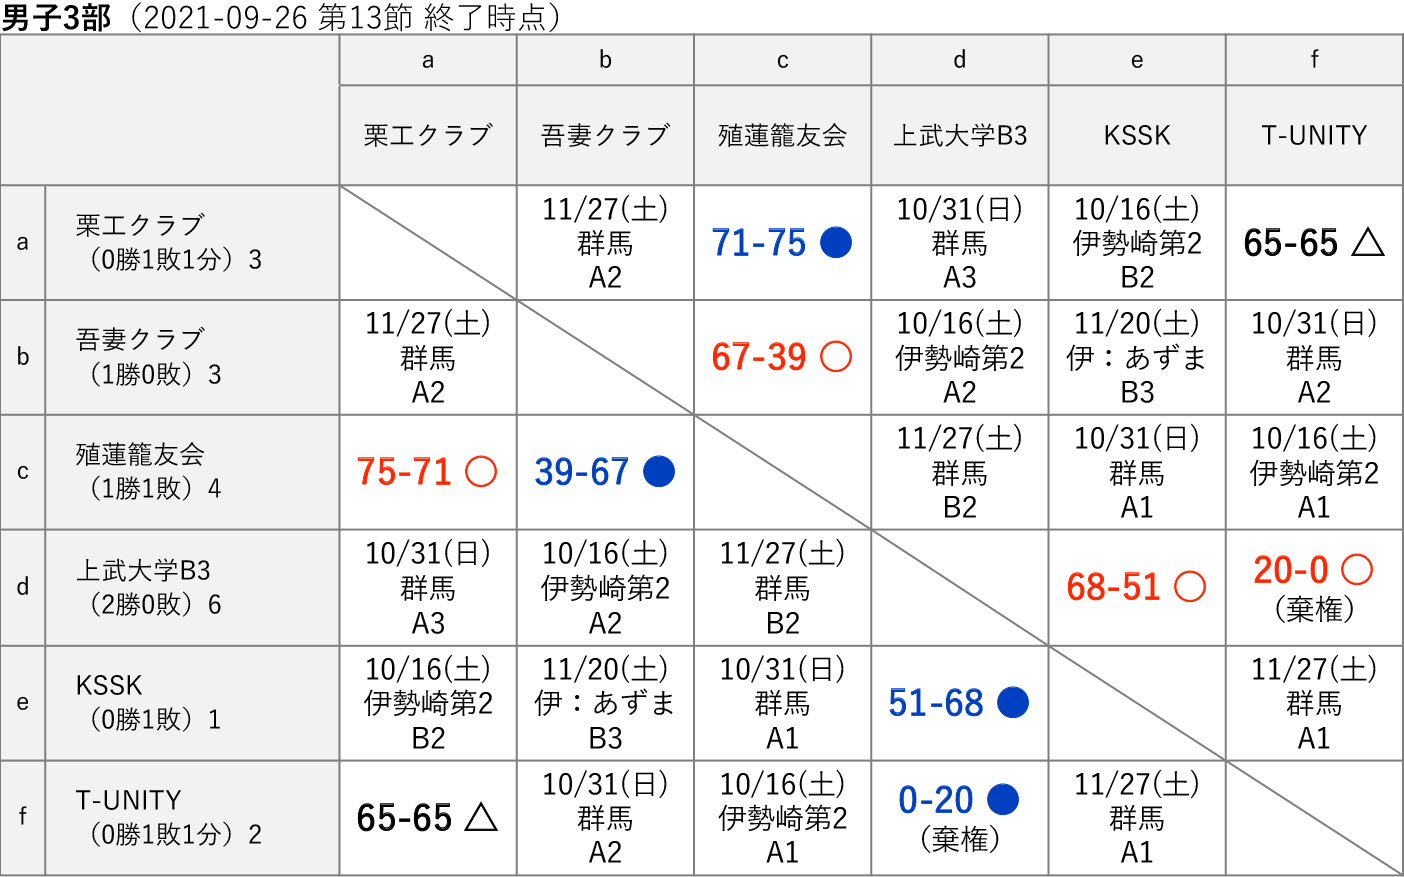 2021社会人リーグ 男子3部 星取り表(2021-09-26 第13節終了時)